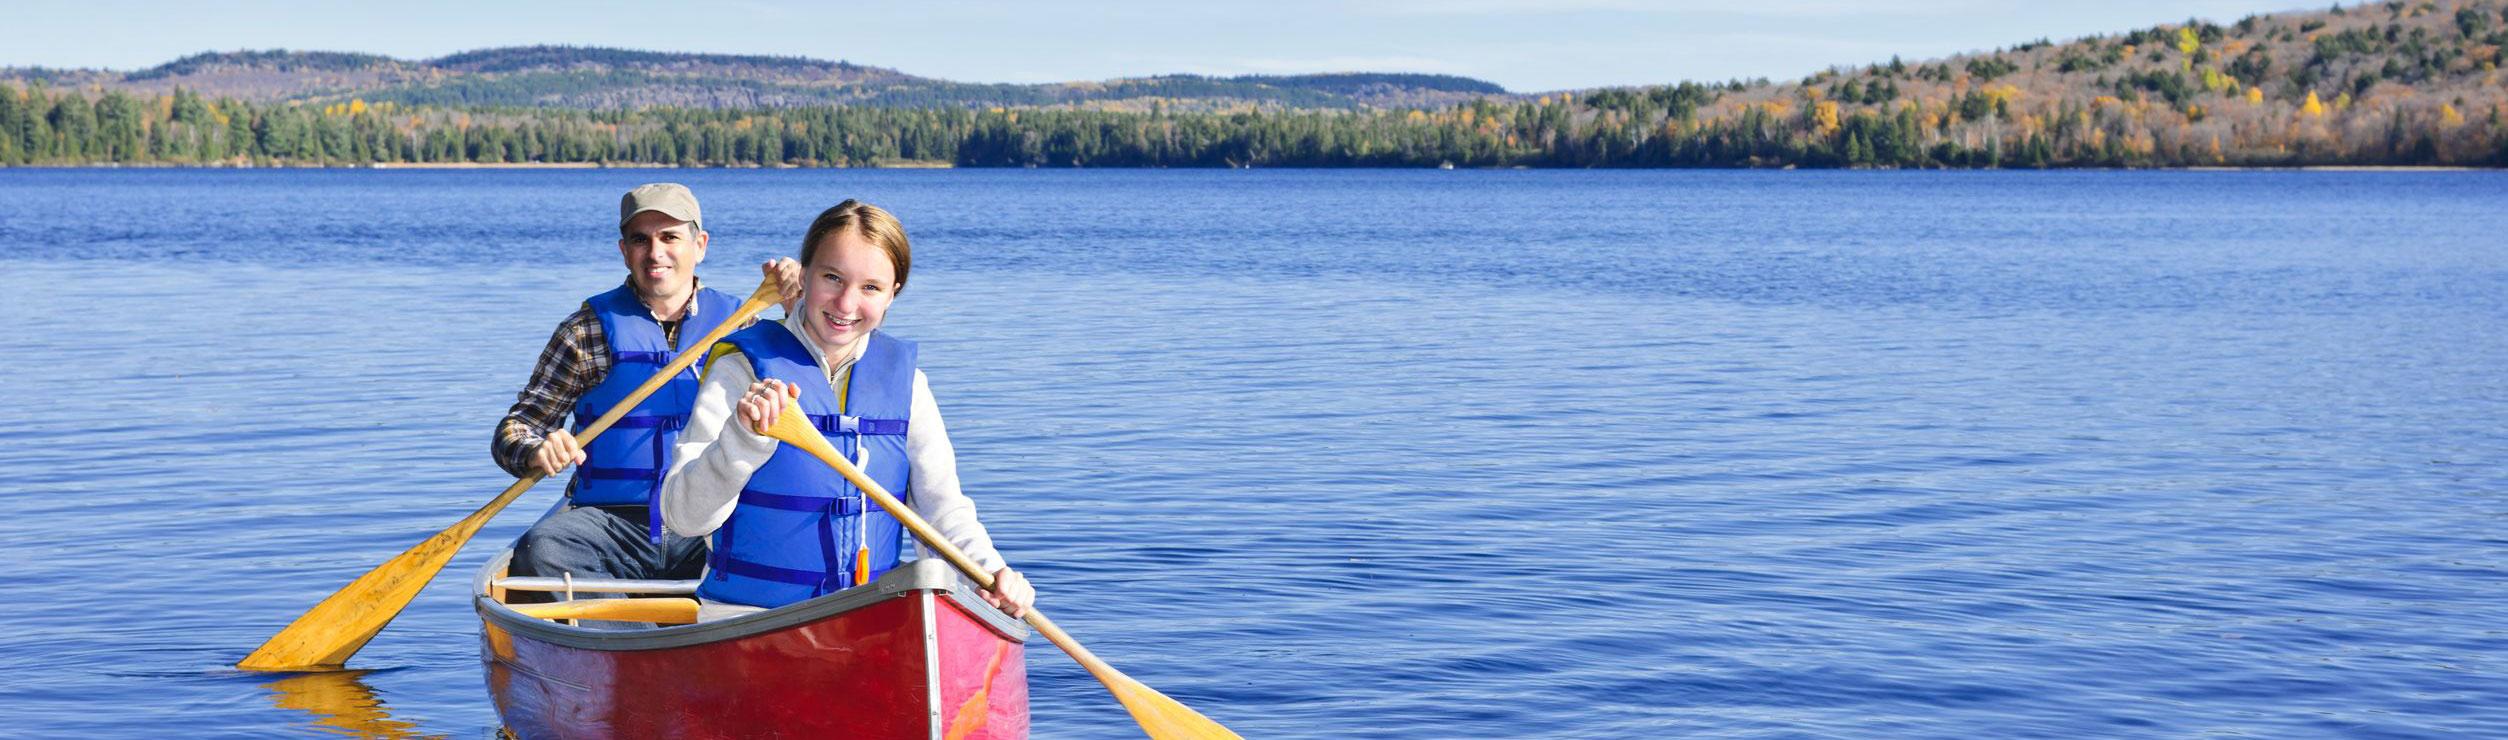 canoeing-in-algonquin-park